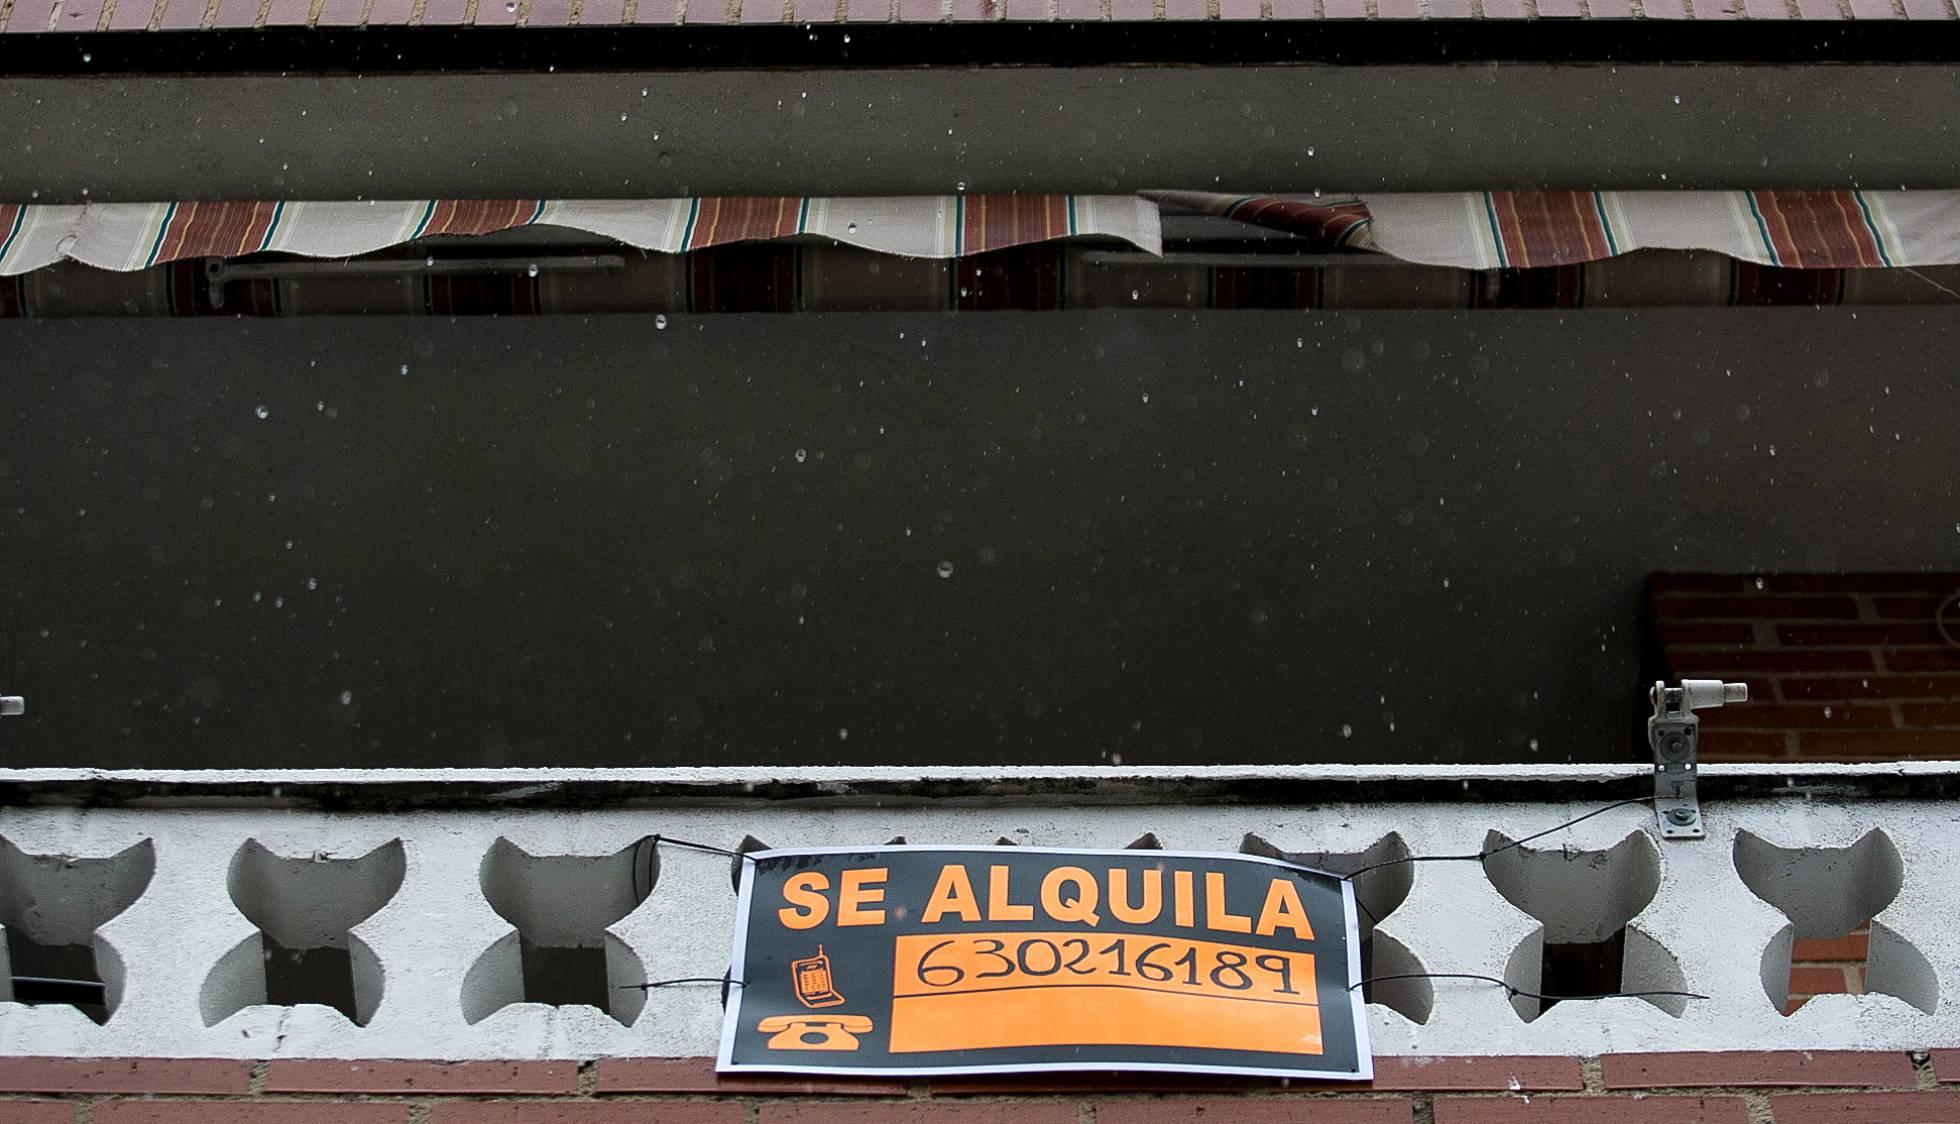 Alquiler federaci n de republicanos rps for Pisos caixabank